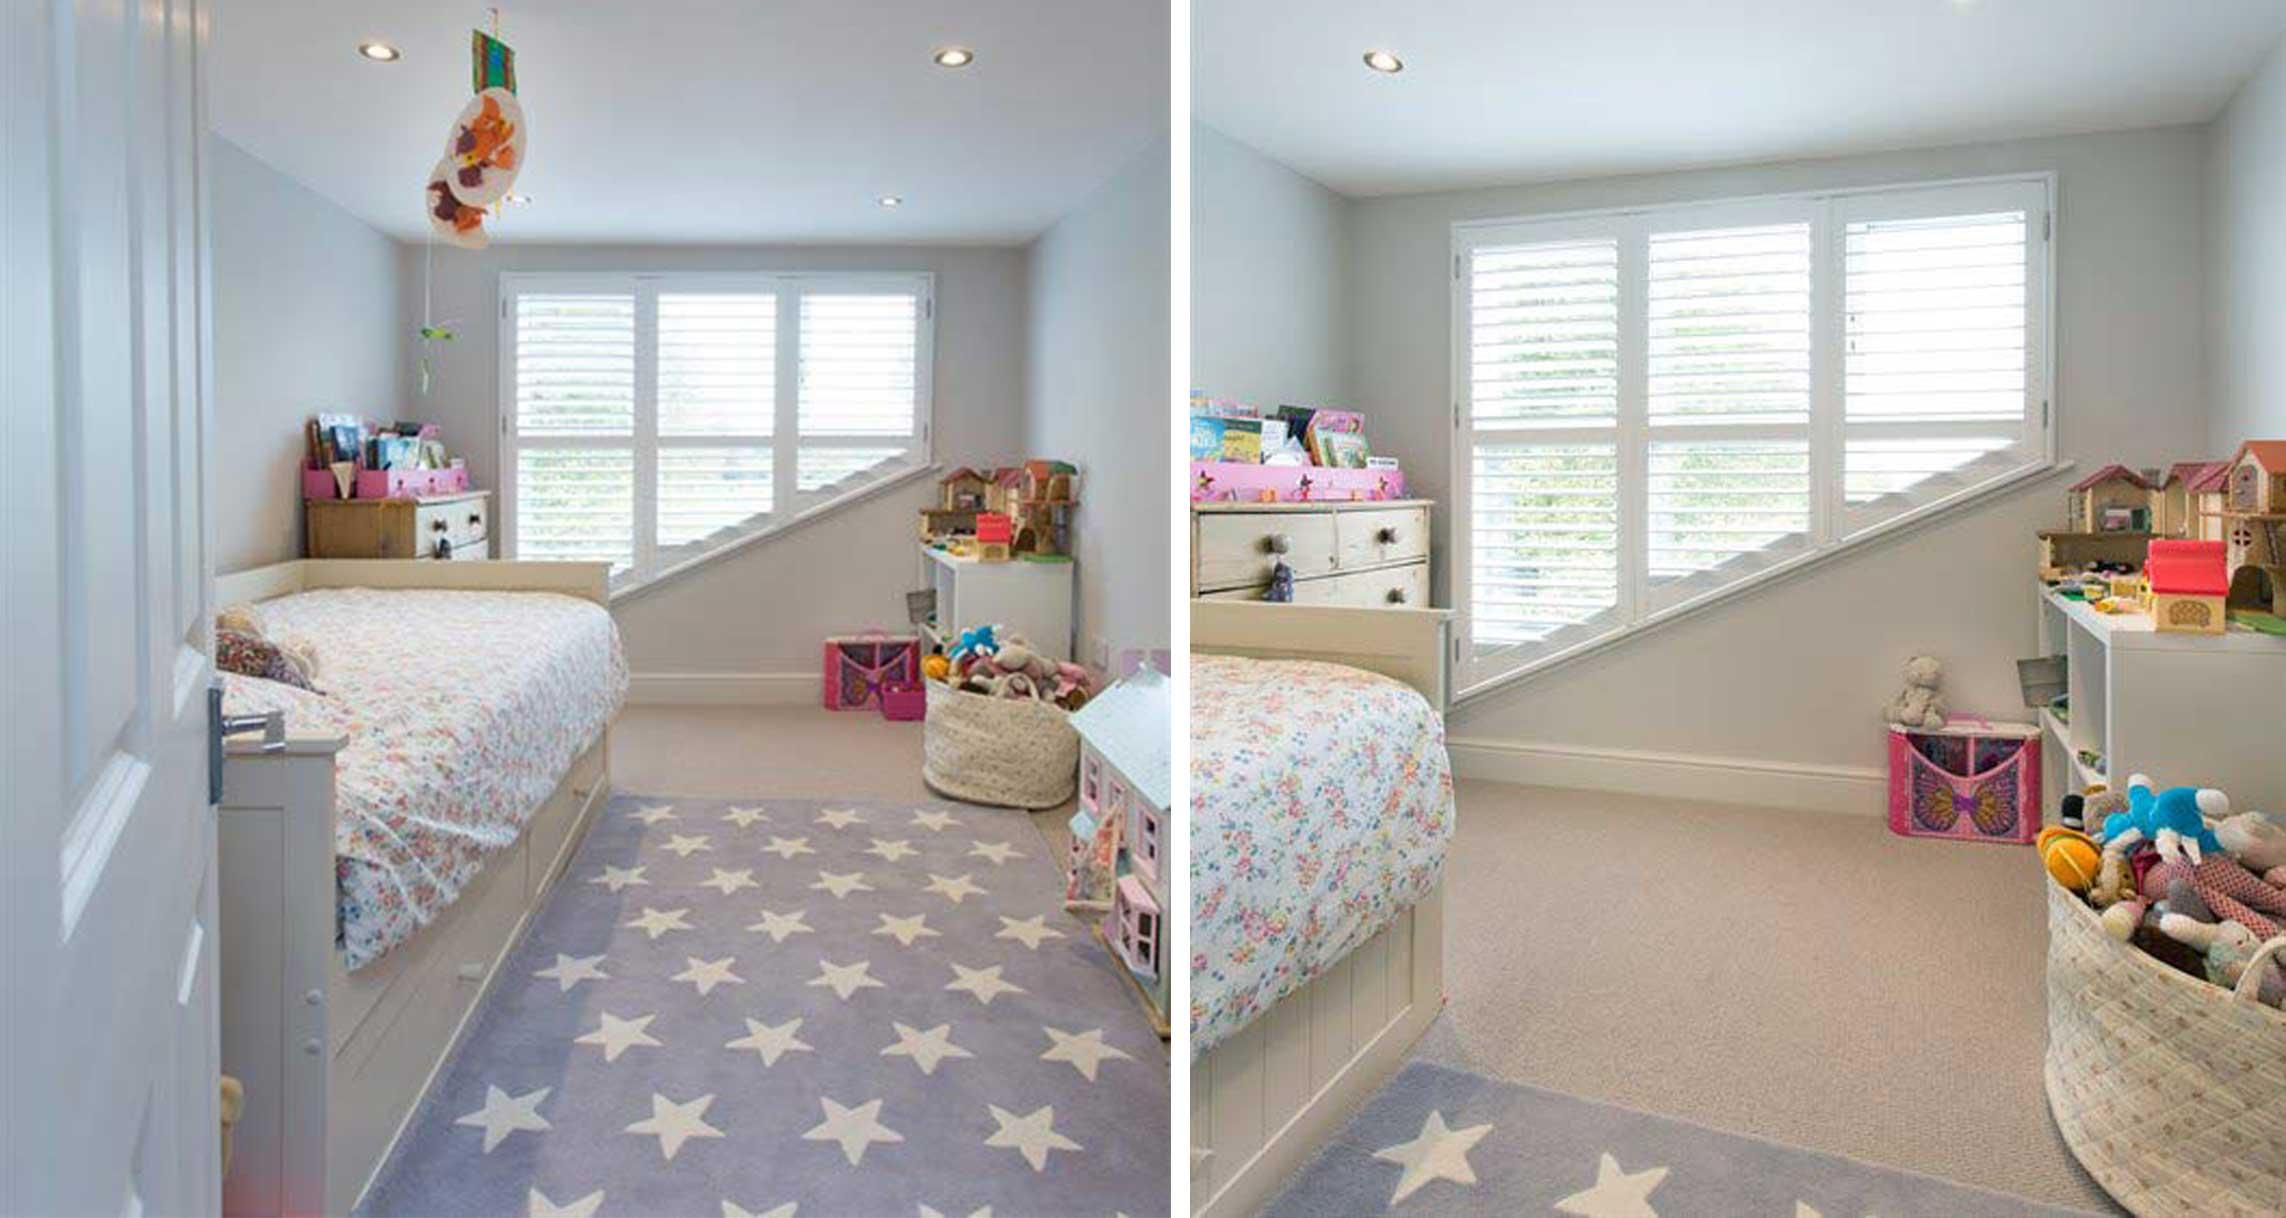 Loft Conversion - kids room - playroom idea - Bespoke Lofts